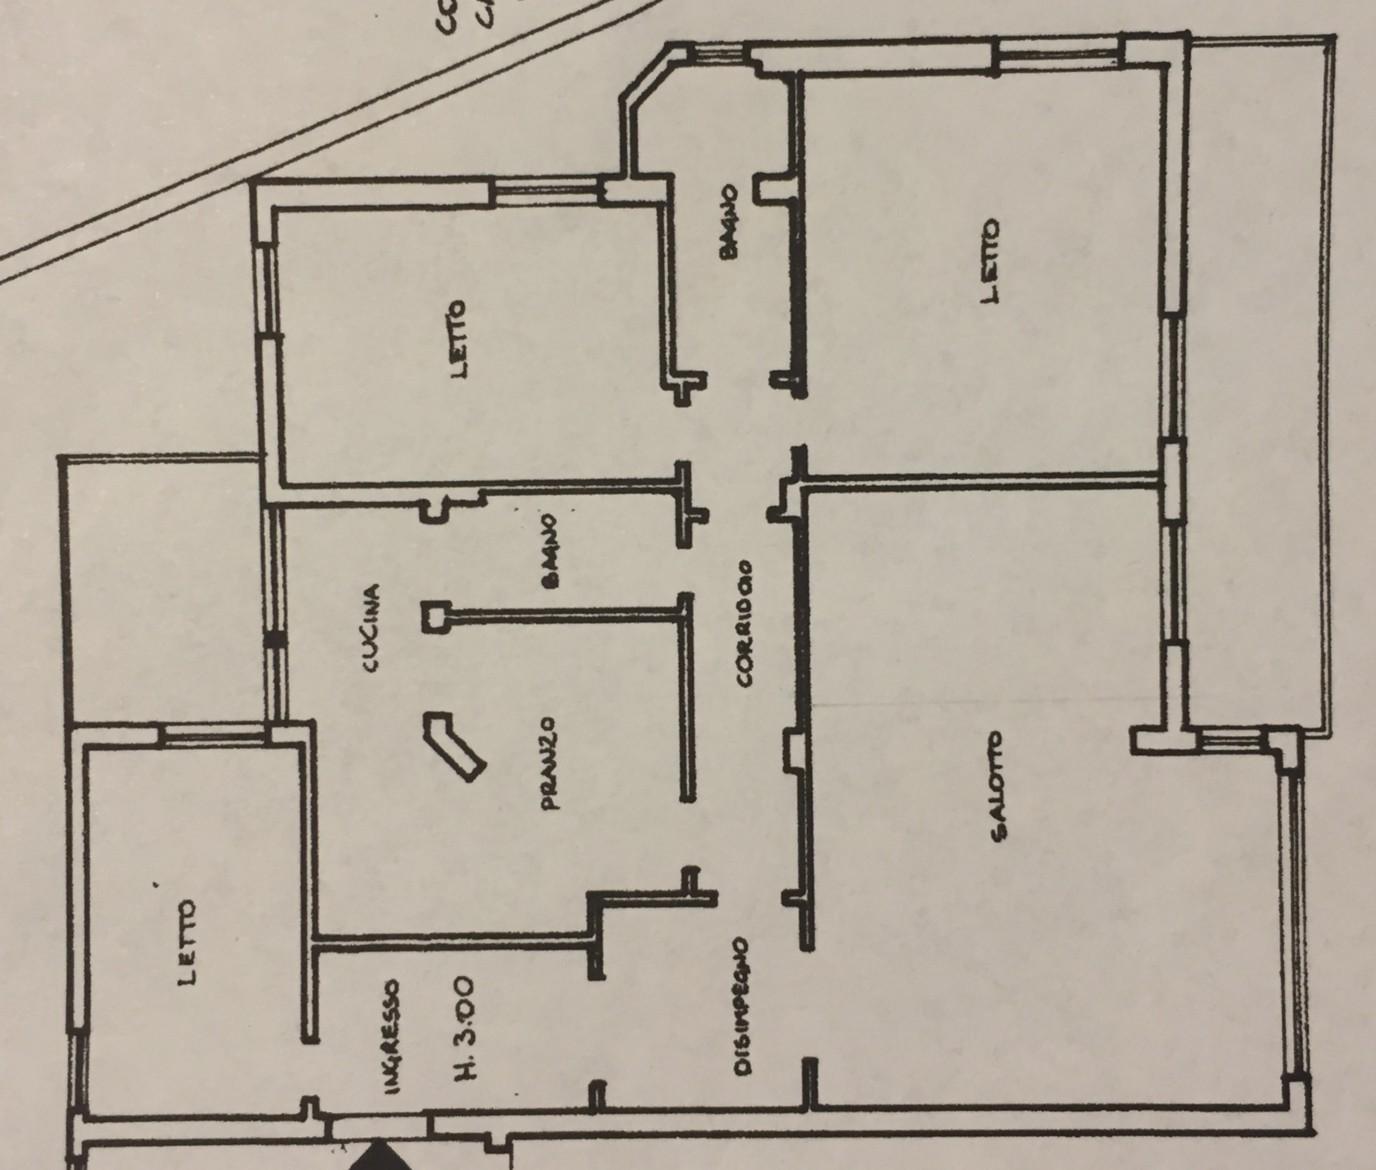 plan via belvedere